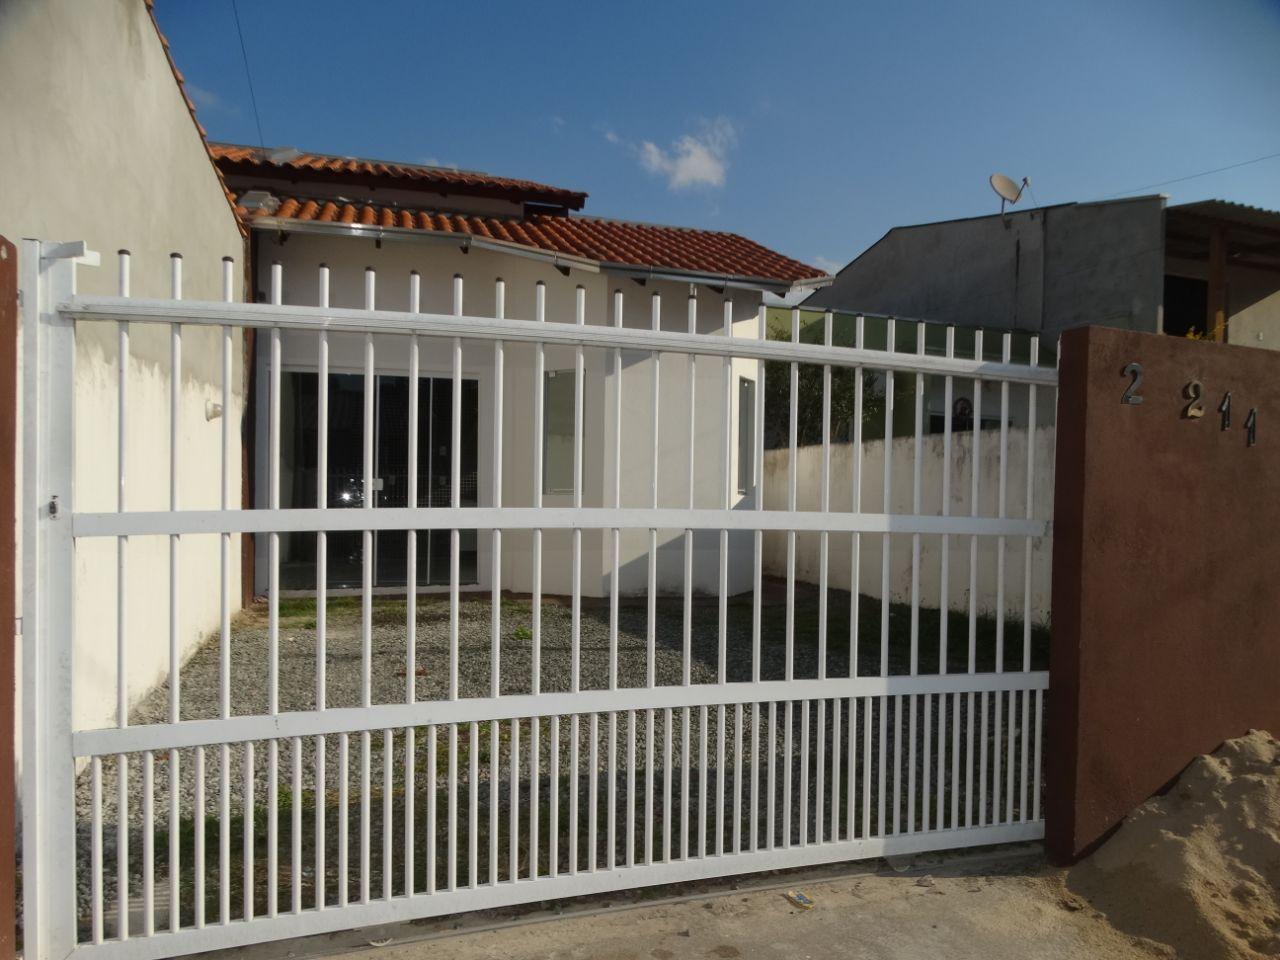 Casa - Gravatá - Navegantes - Aluguel - R$ 1.100,00